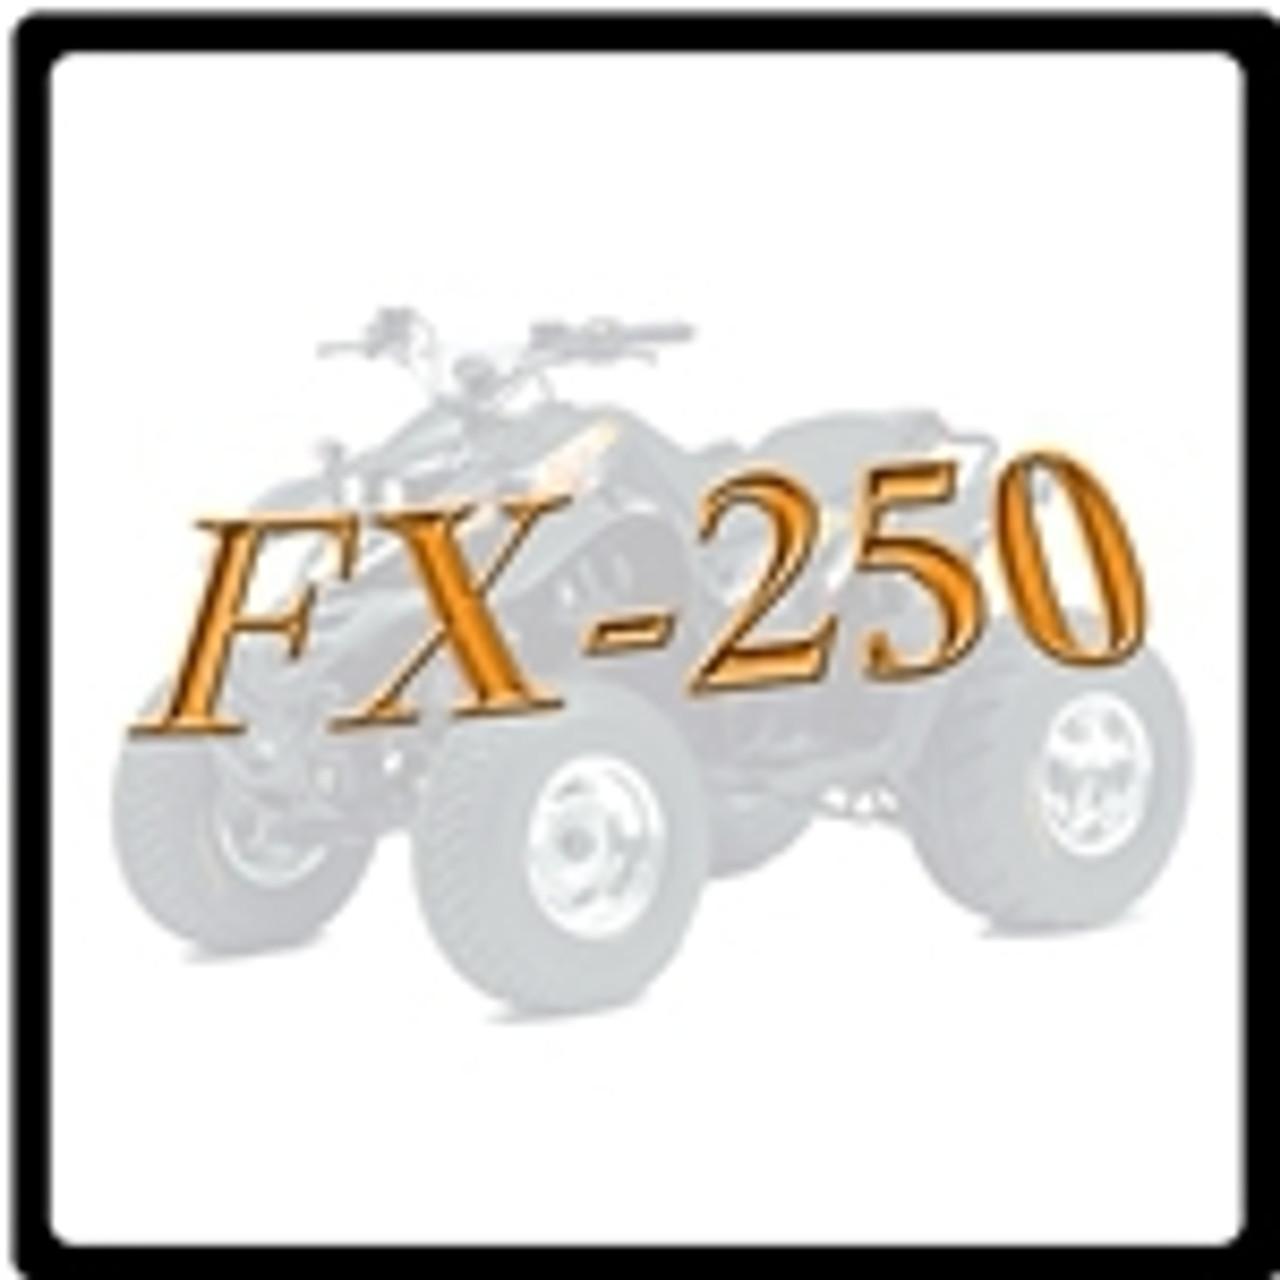 FX-250